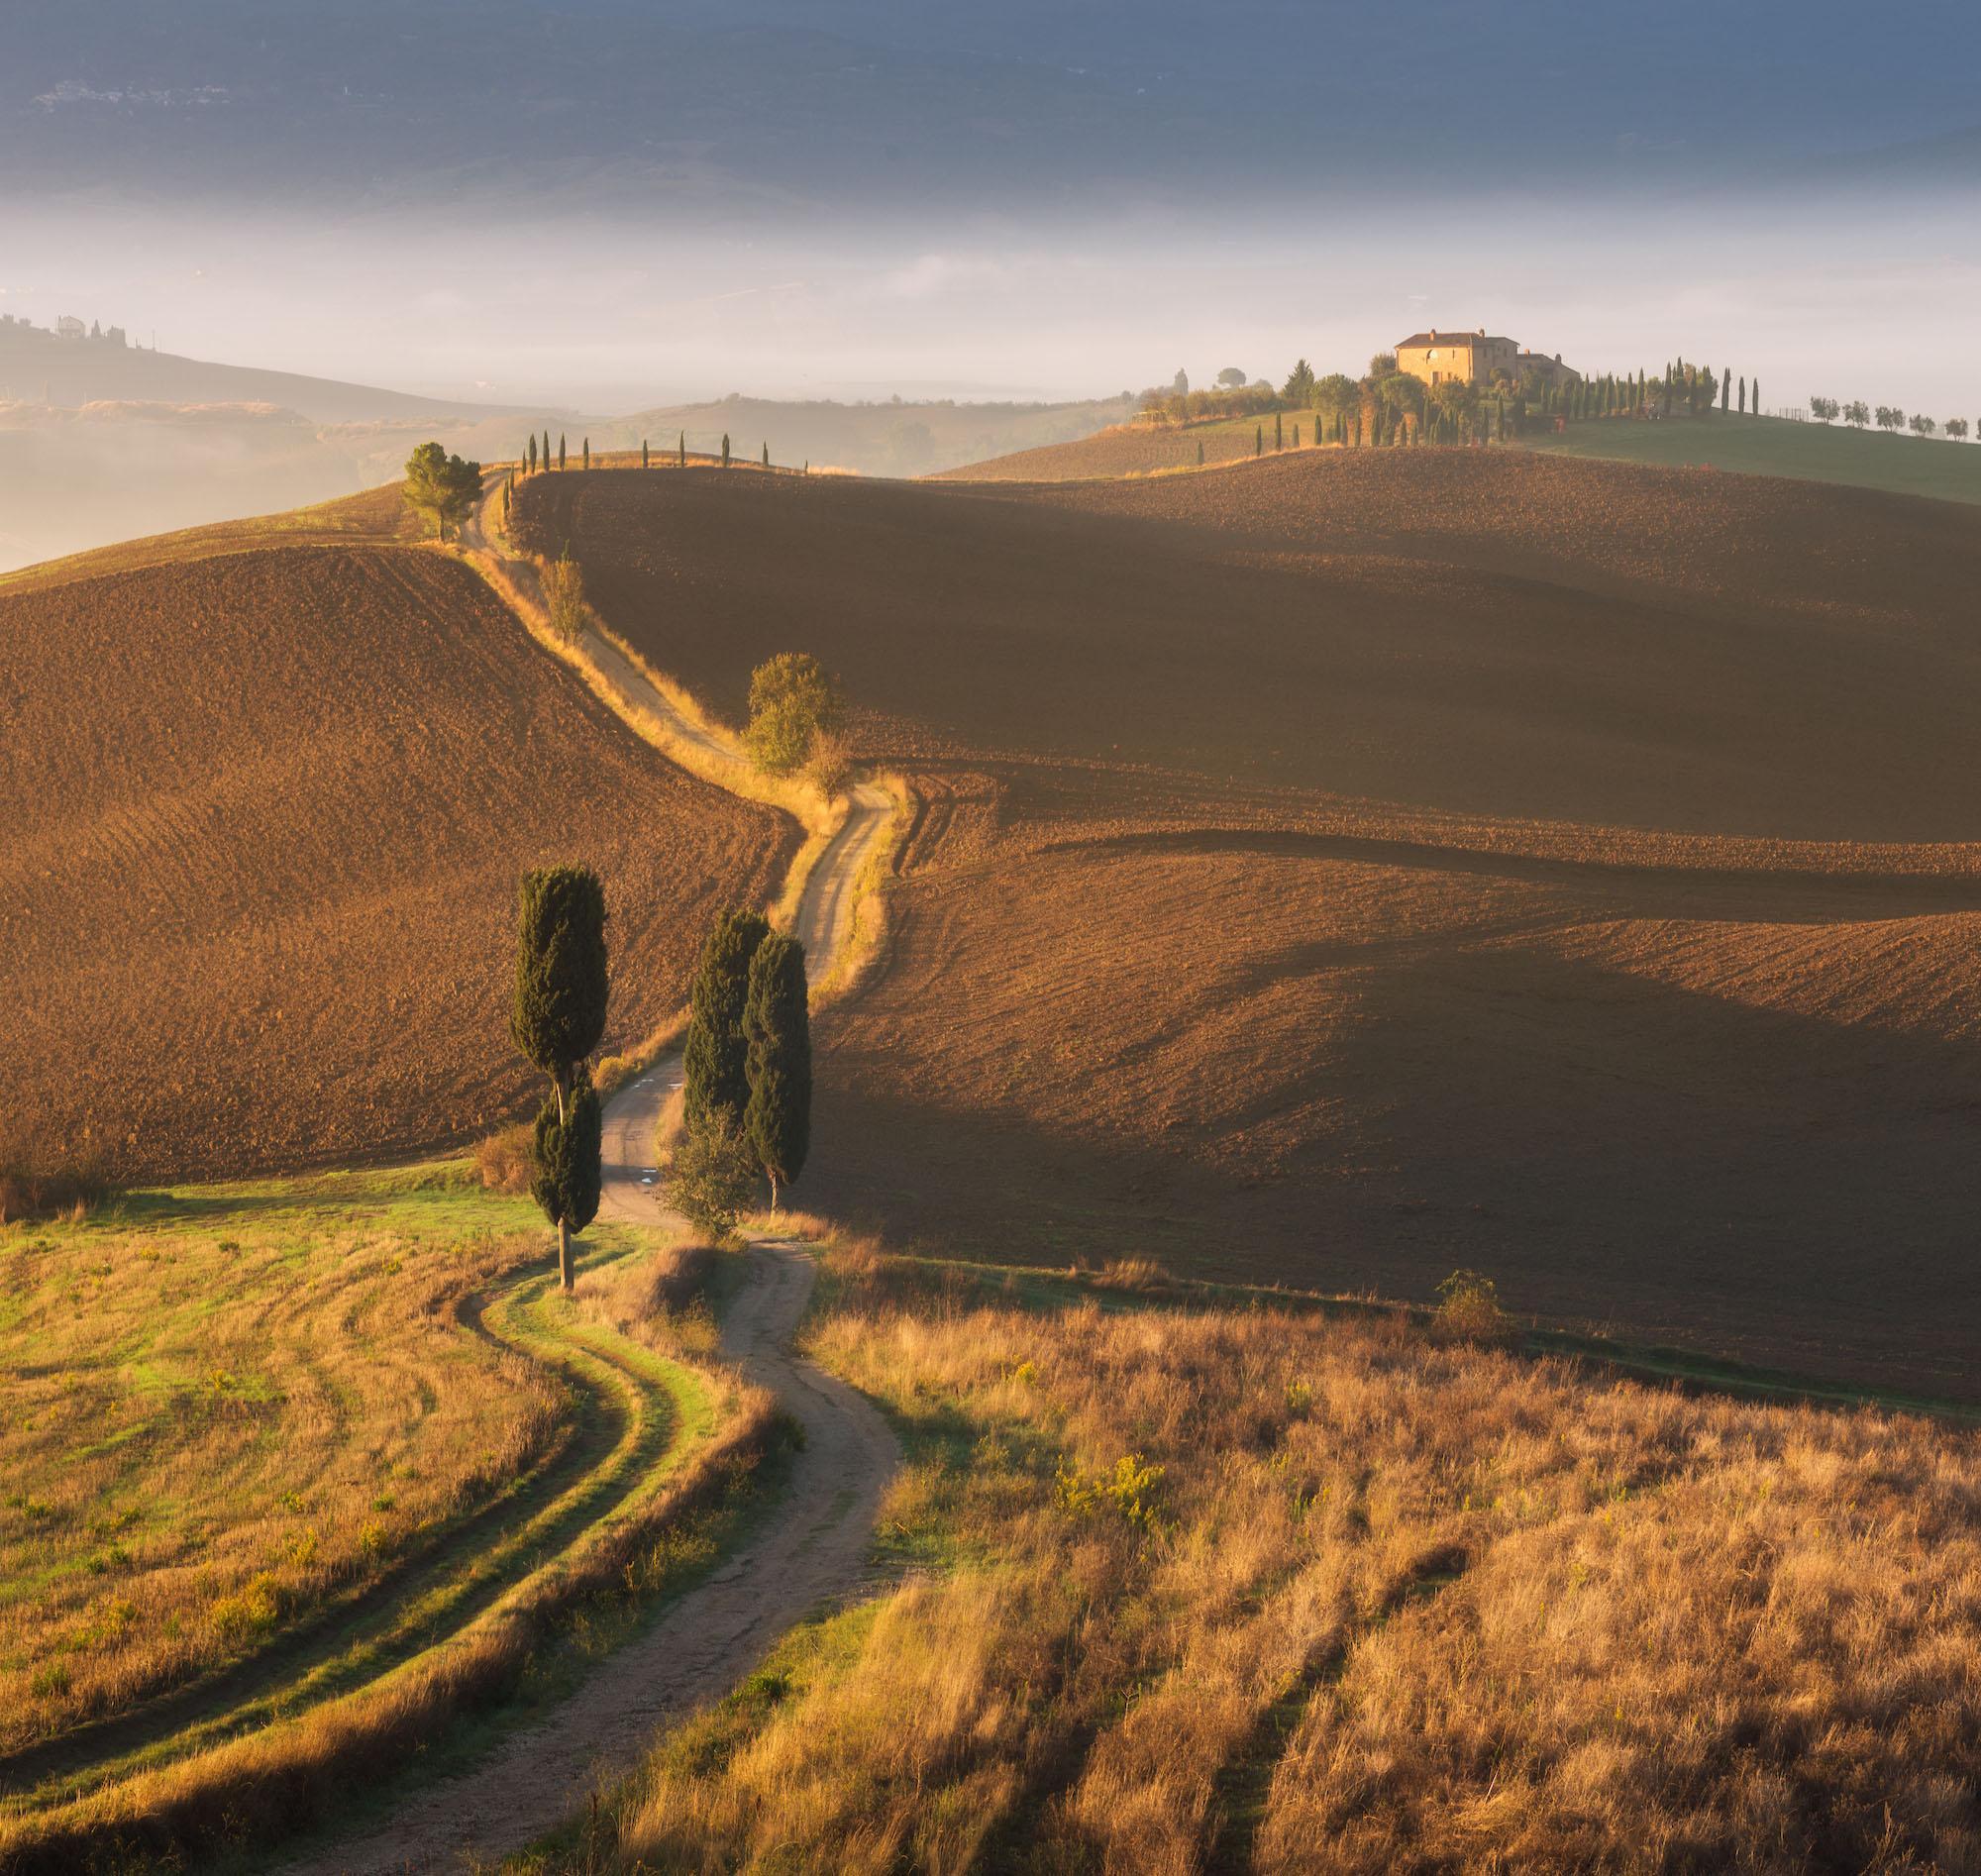 Autumn Tuscany by Daniel Kordan 1